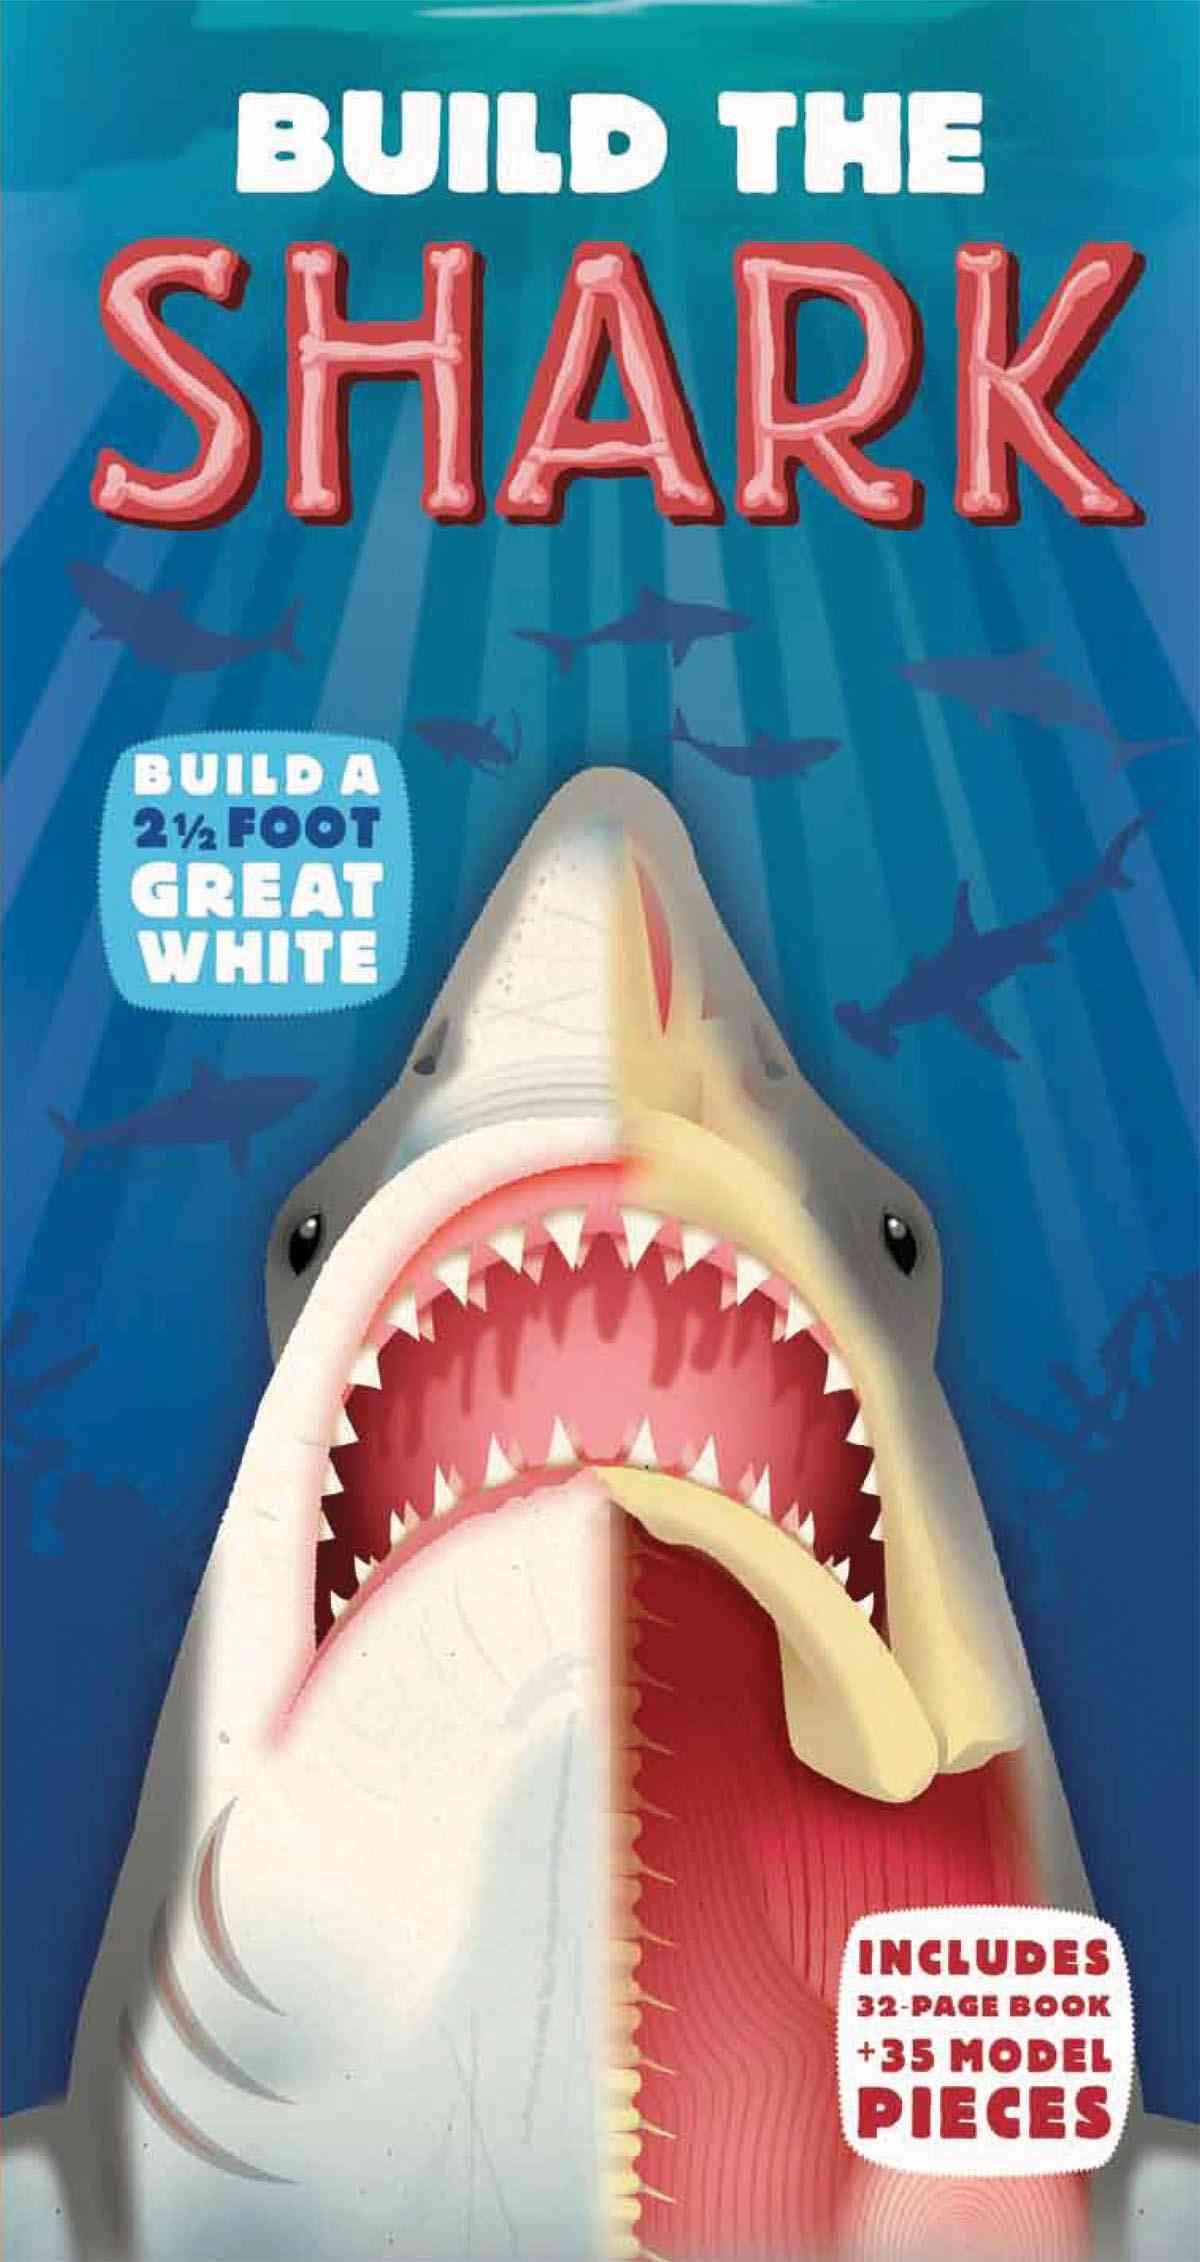 Build the Shark By Taylor, Barbara/ Ruffle, Mark (ILT)/ Bernstein, Galia (ILT)